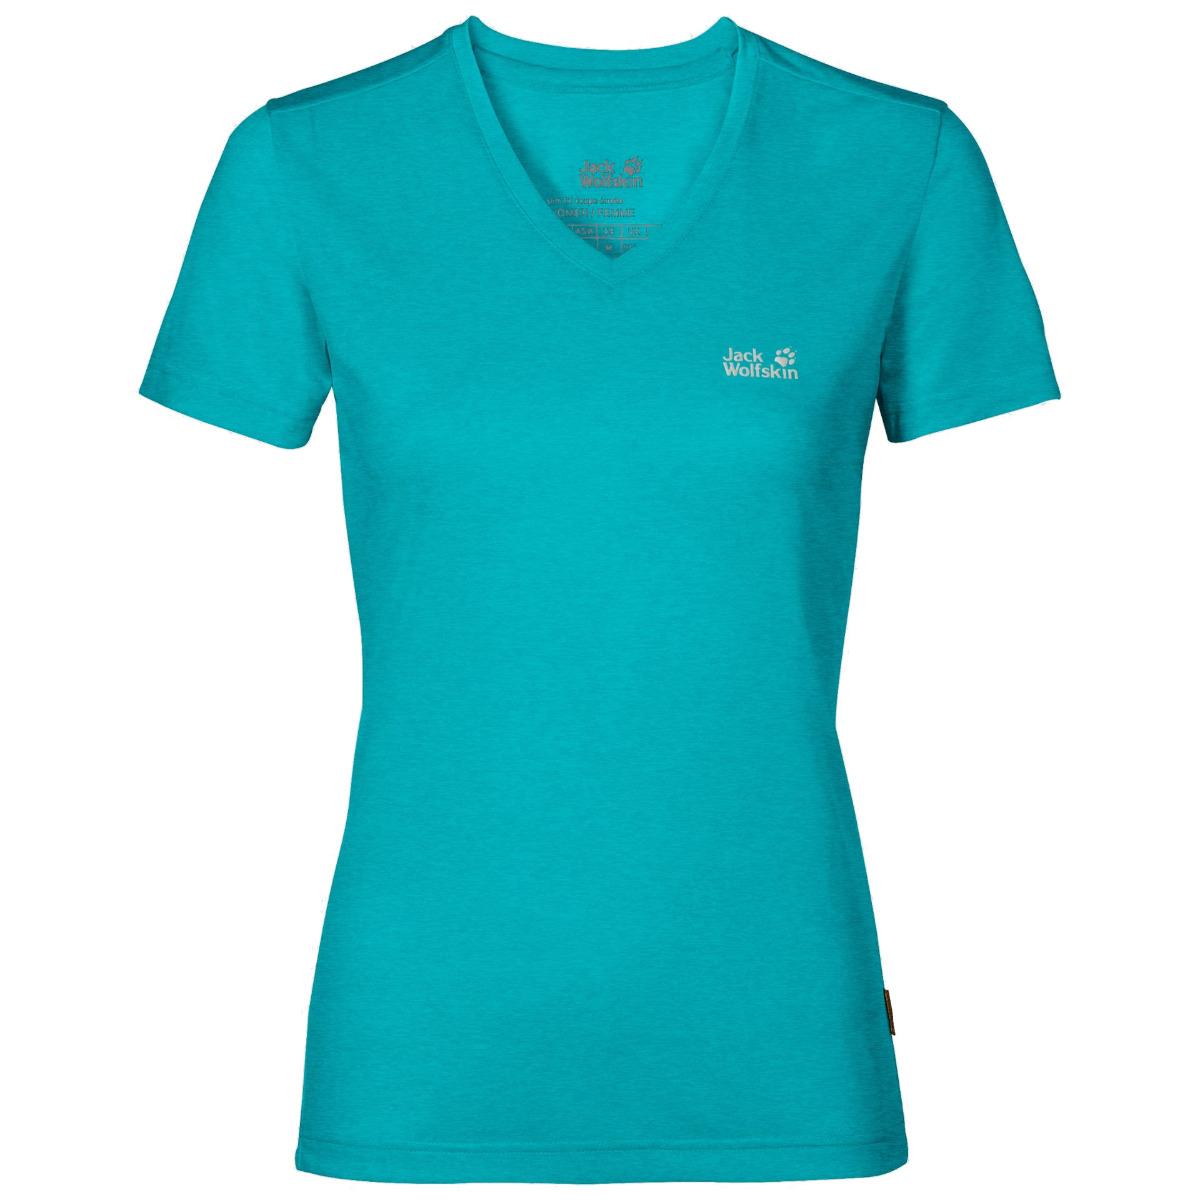 Jack Wolfskin Womens Crosstrail T-shirt-aquamarine-s